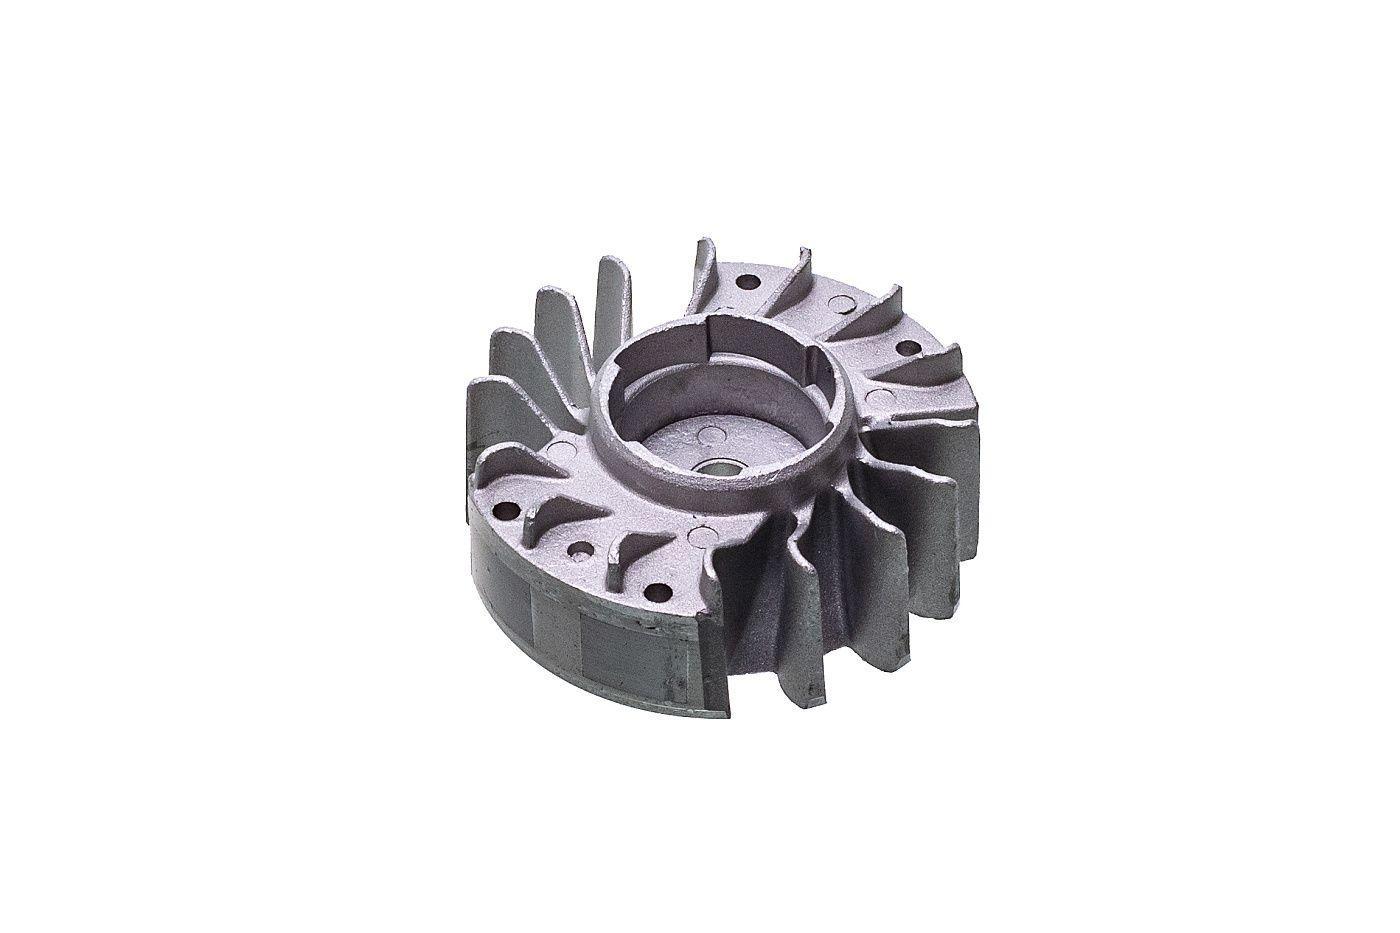 Ventilátor Stihl MS170 MS180 017 018 (1130 400 1201)